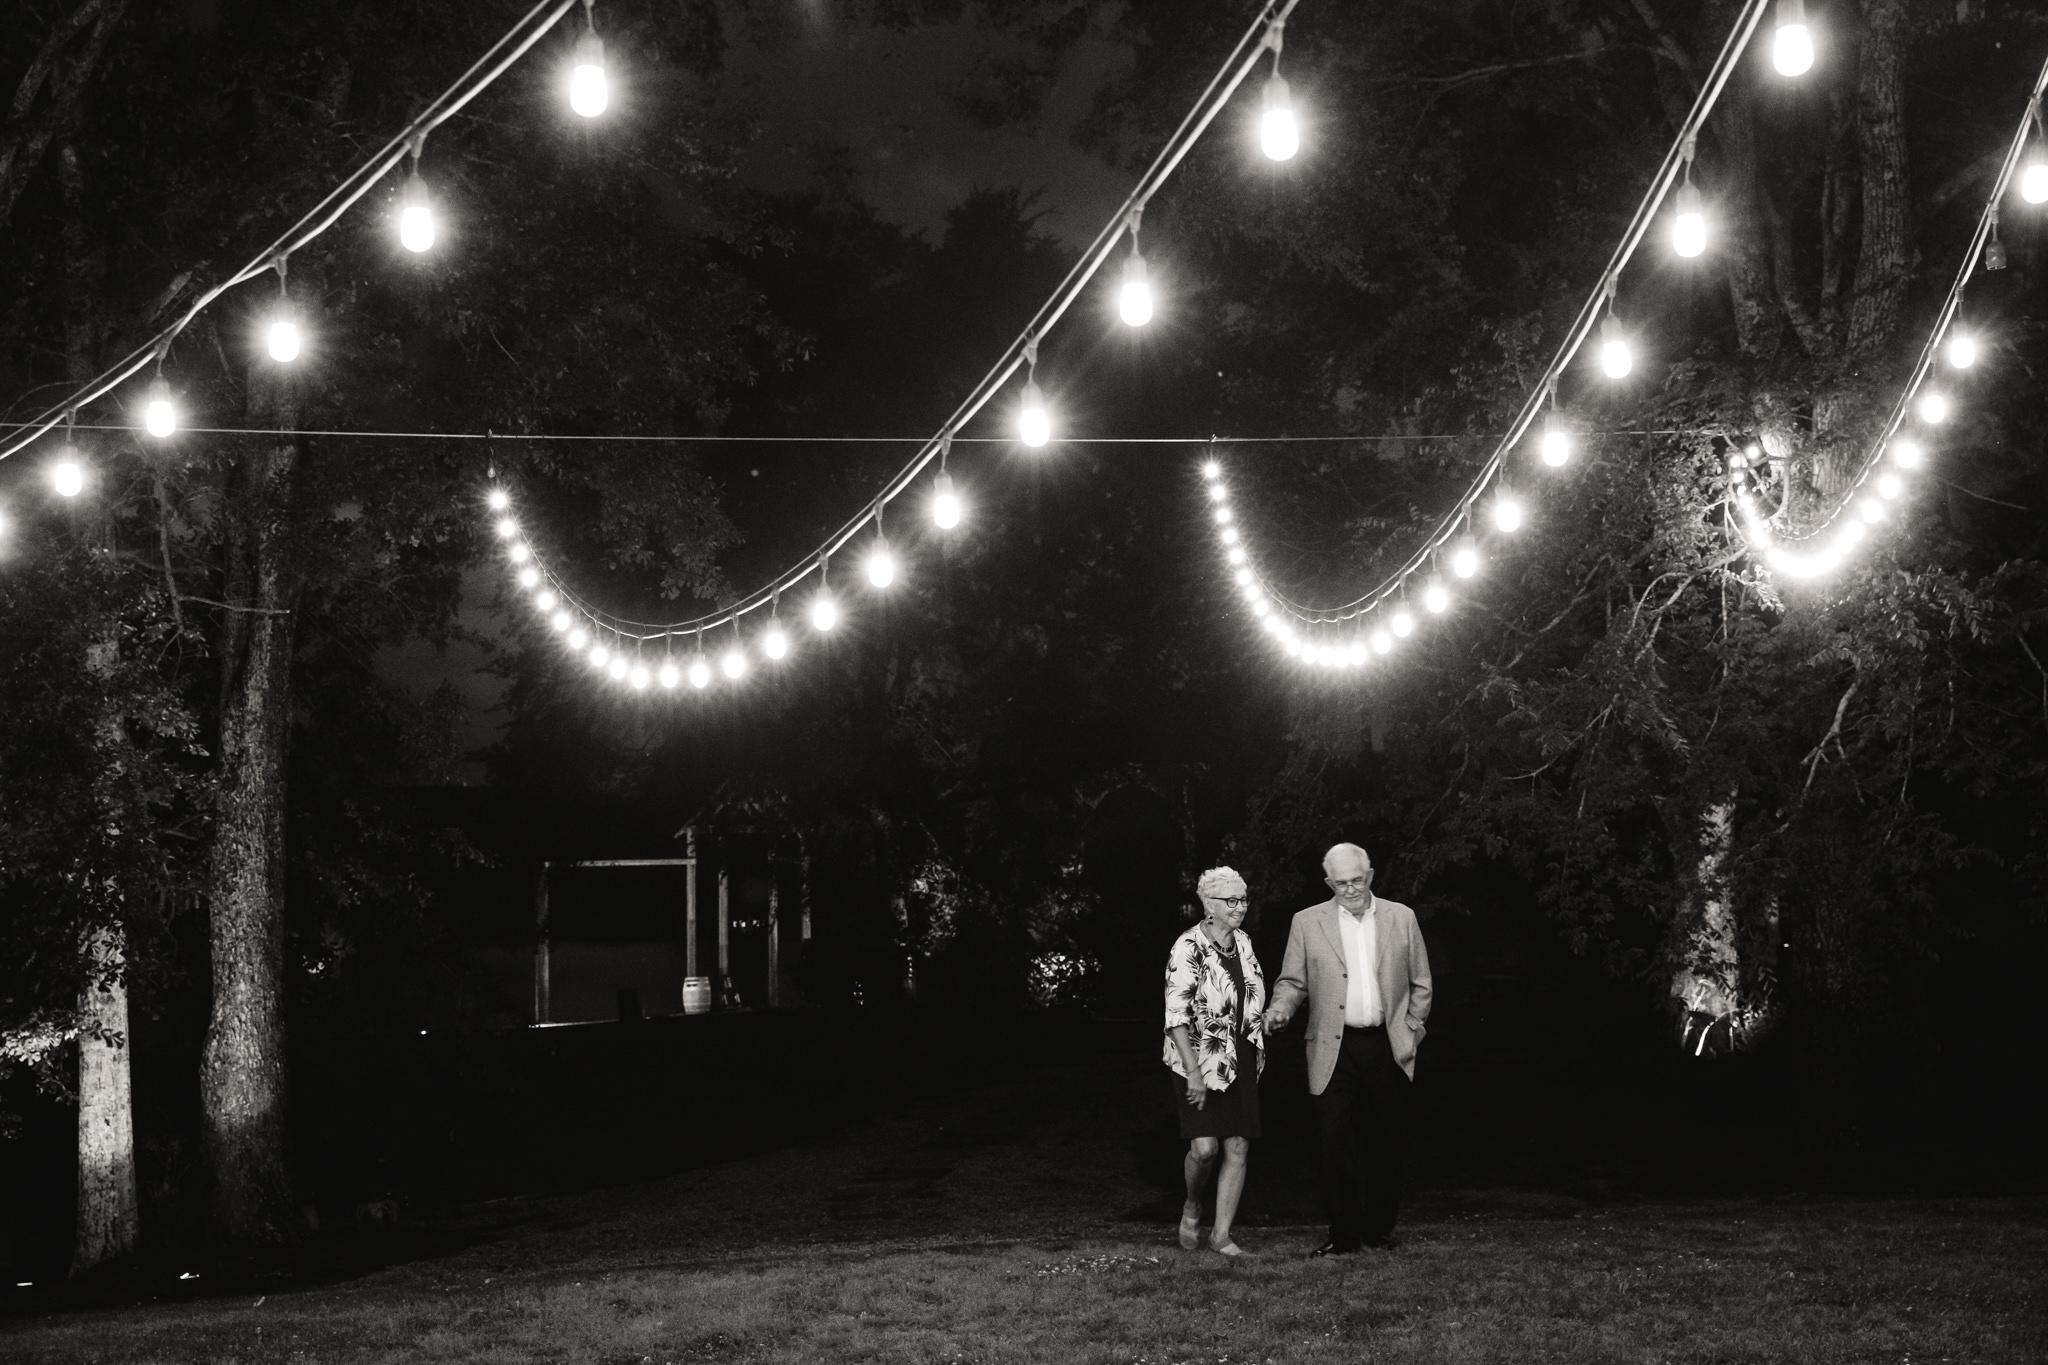 phantom-canyon-brewery-colorado-springs-wedding-photographer-451.jpg